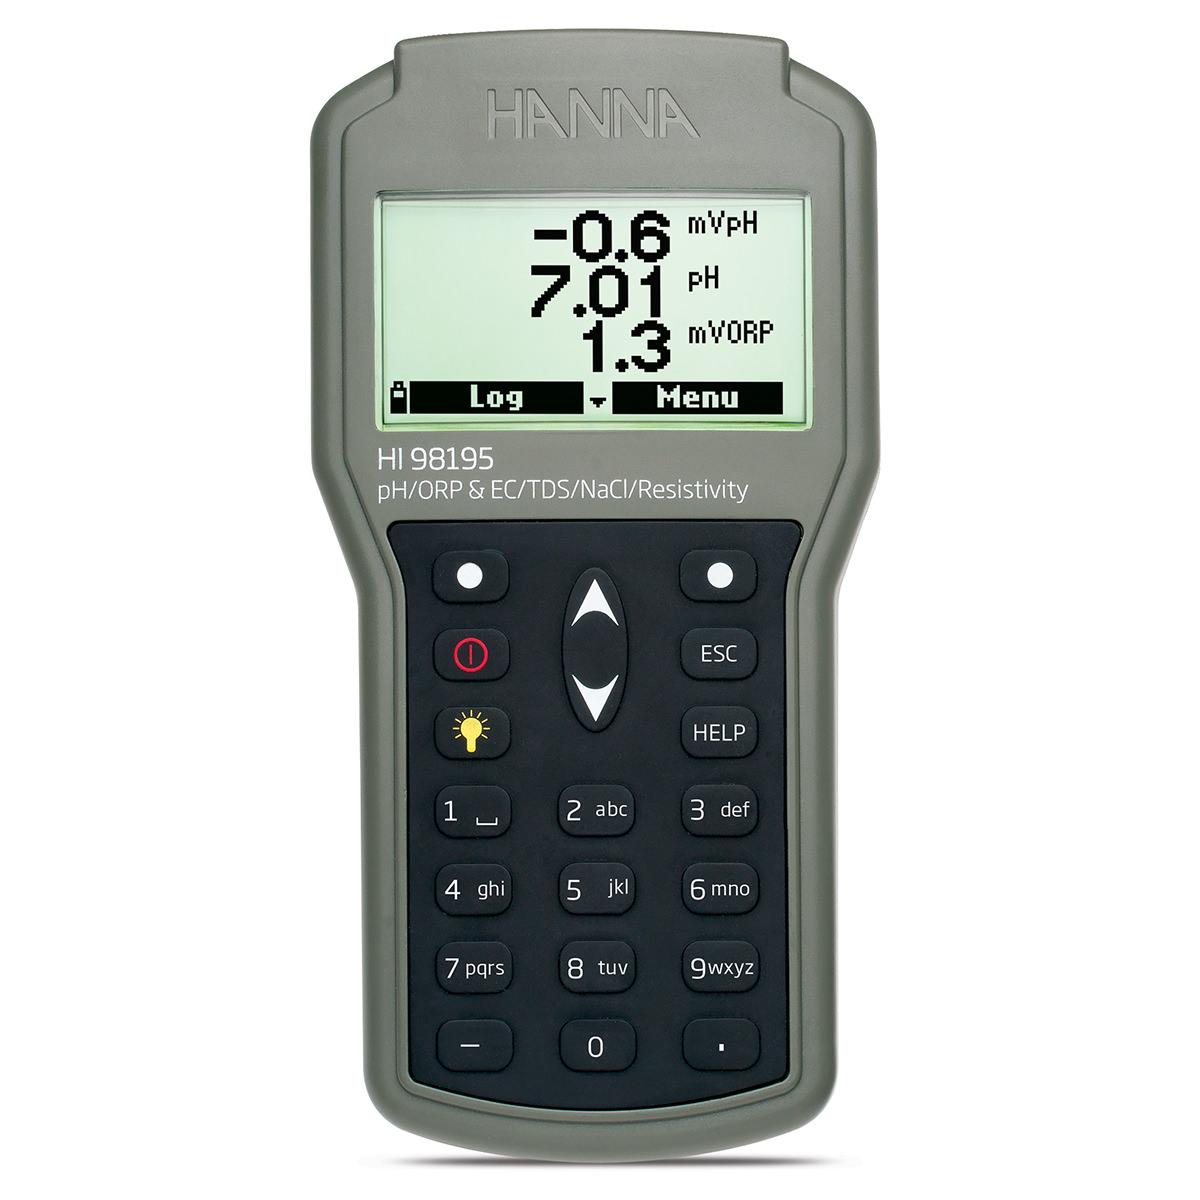 Misuratore multiparametro di pH/ORP/EC/Pressione/Temperatura a tenuta stagna - HI98195